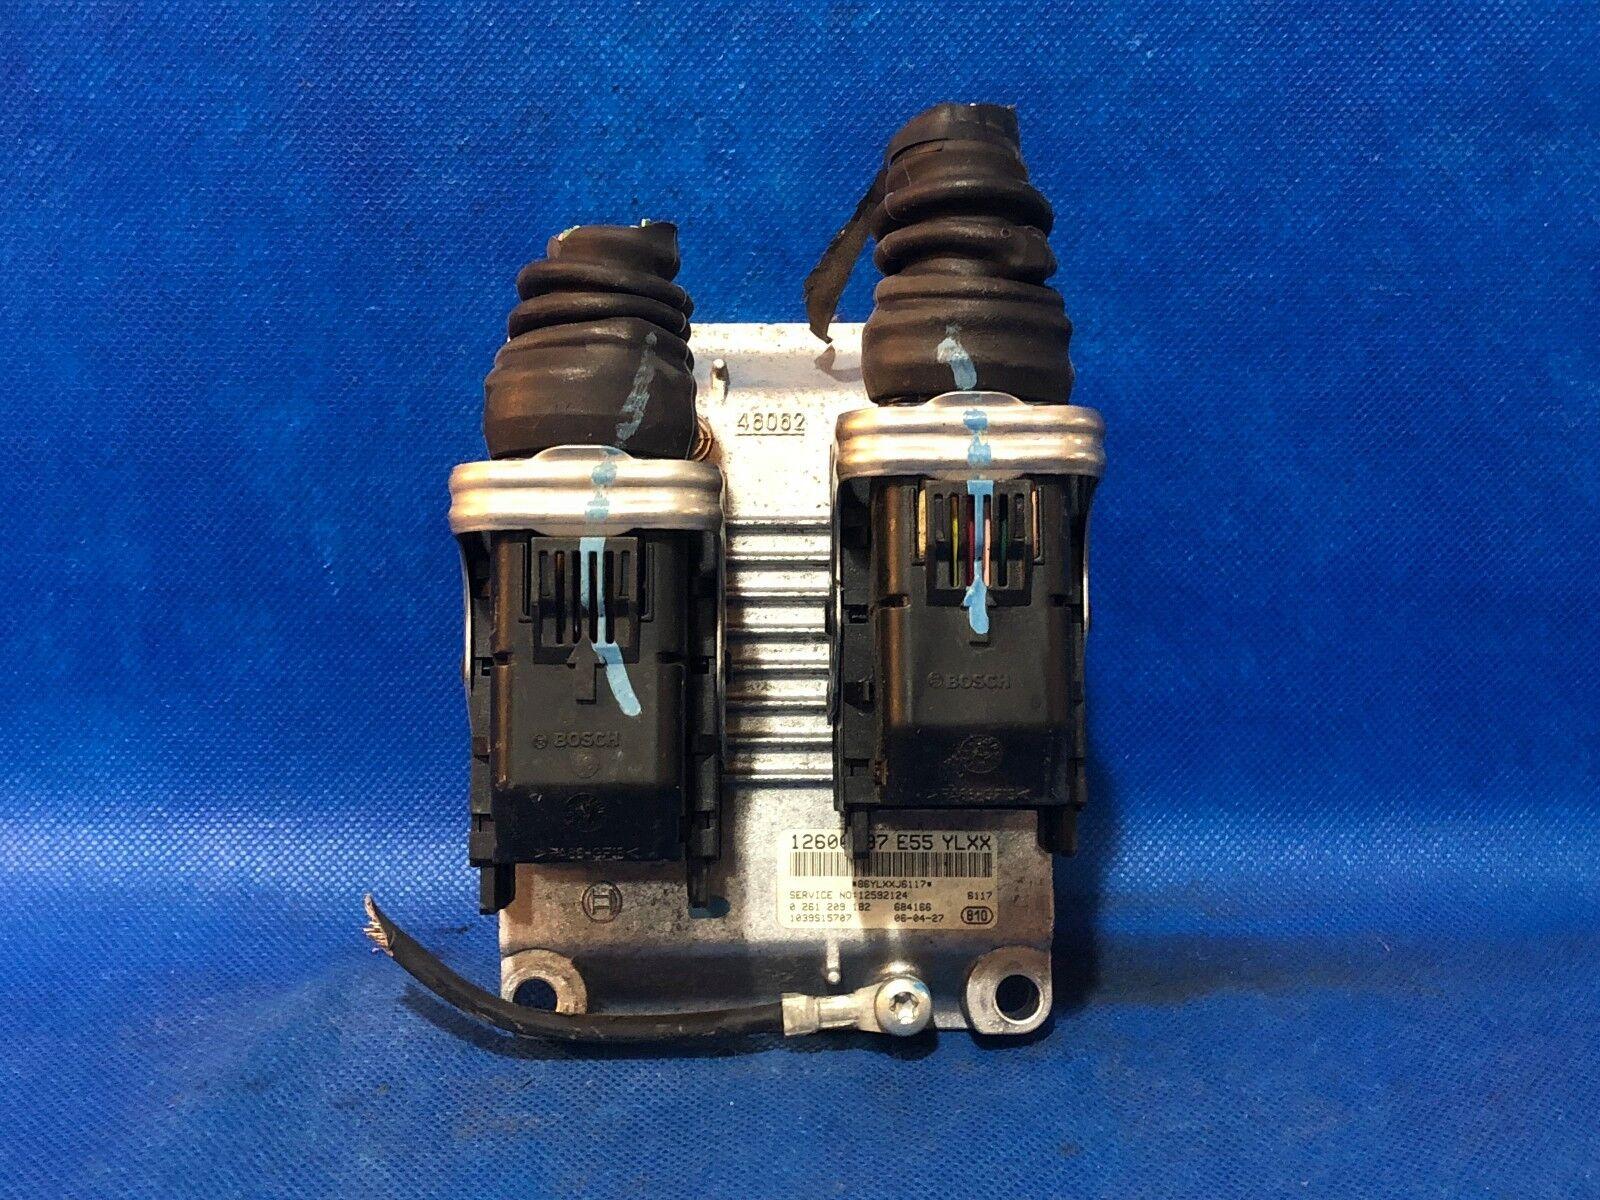 07 Cadillac Cts Srx Ecu Engine Computer Pcm Ecm 12600797 Ylxx Lt1 Wiring Harness Ebay 0261209182